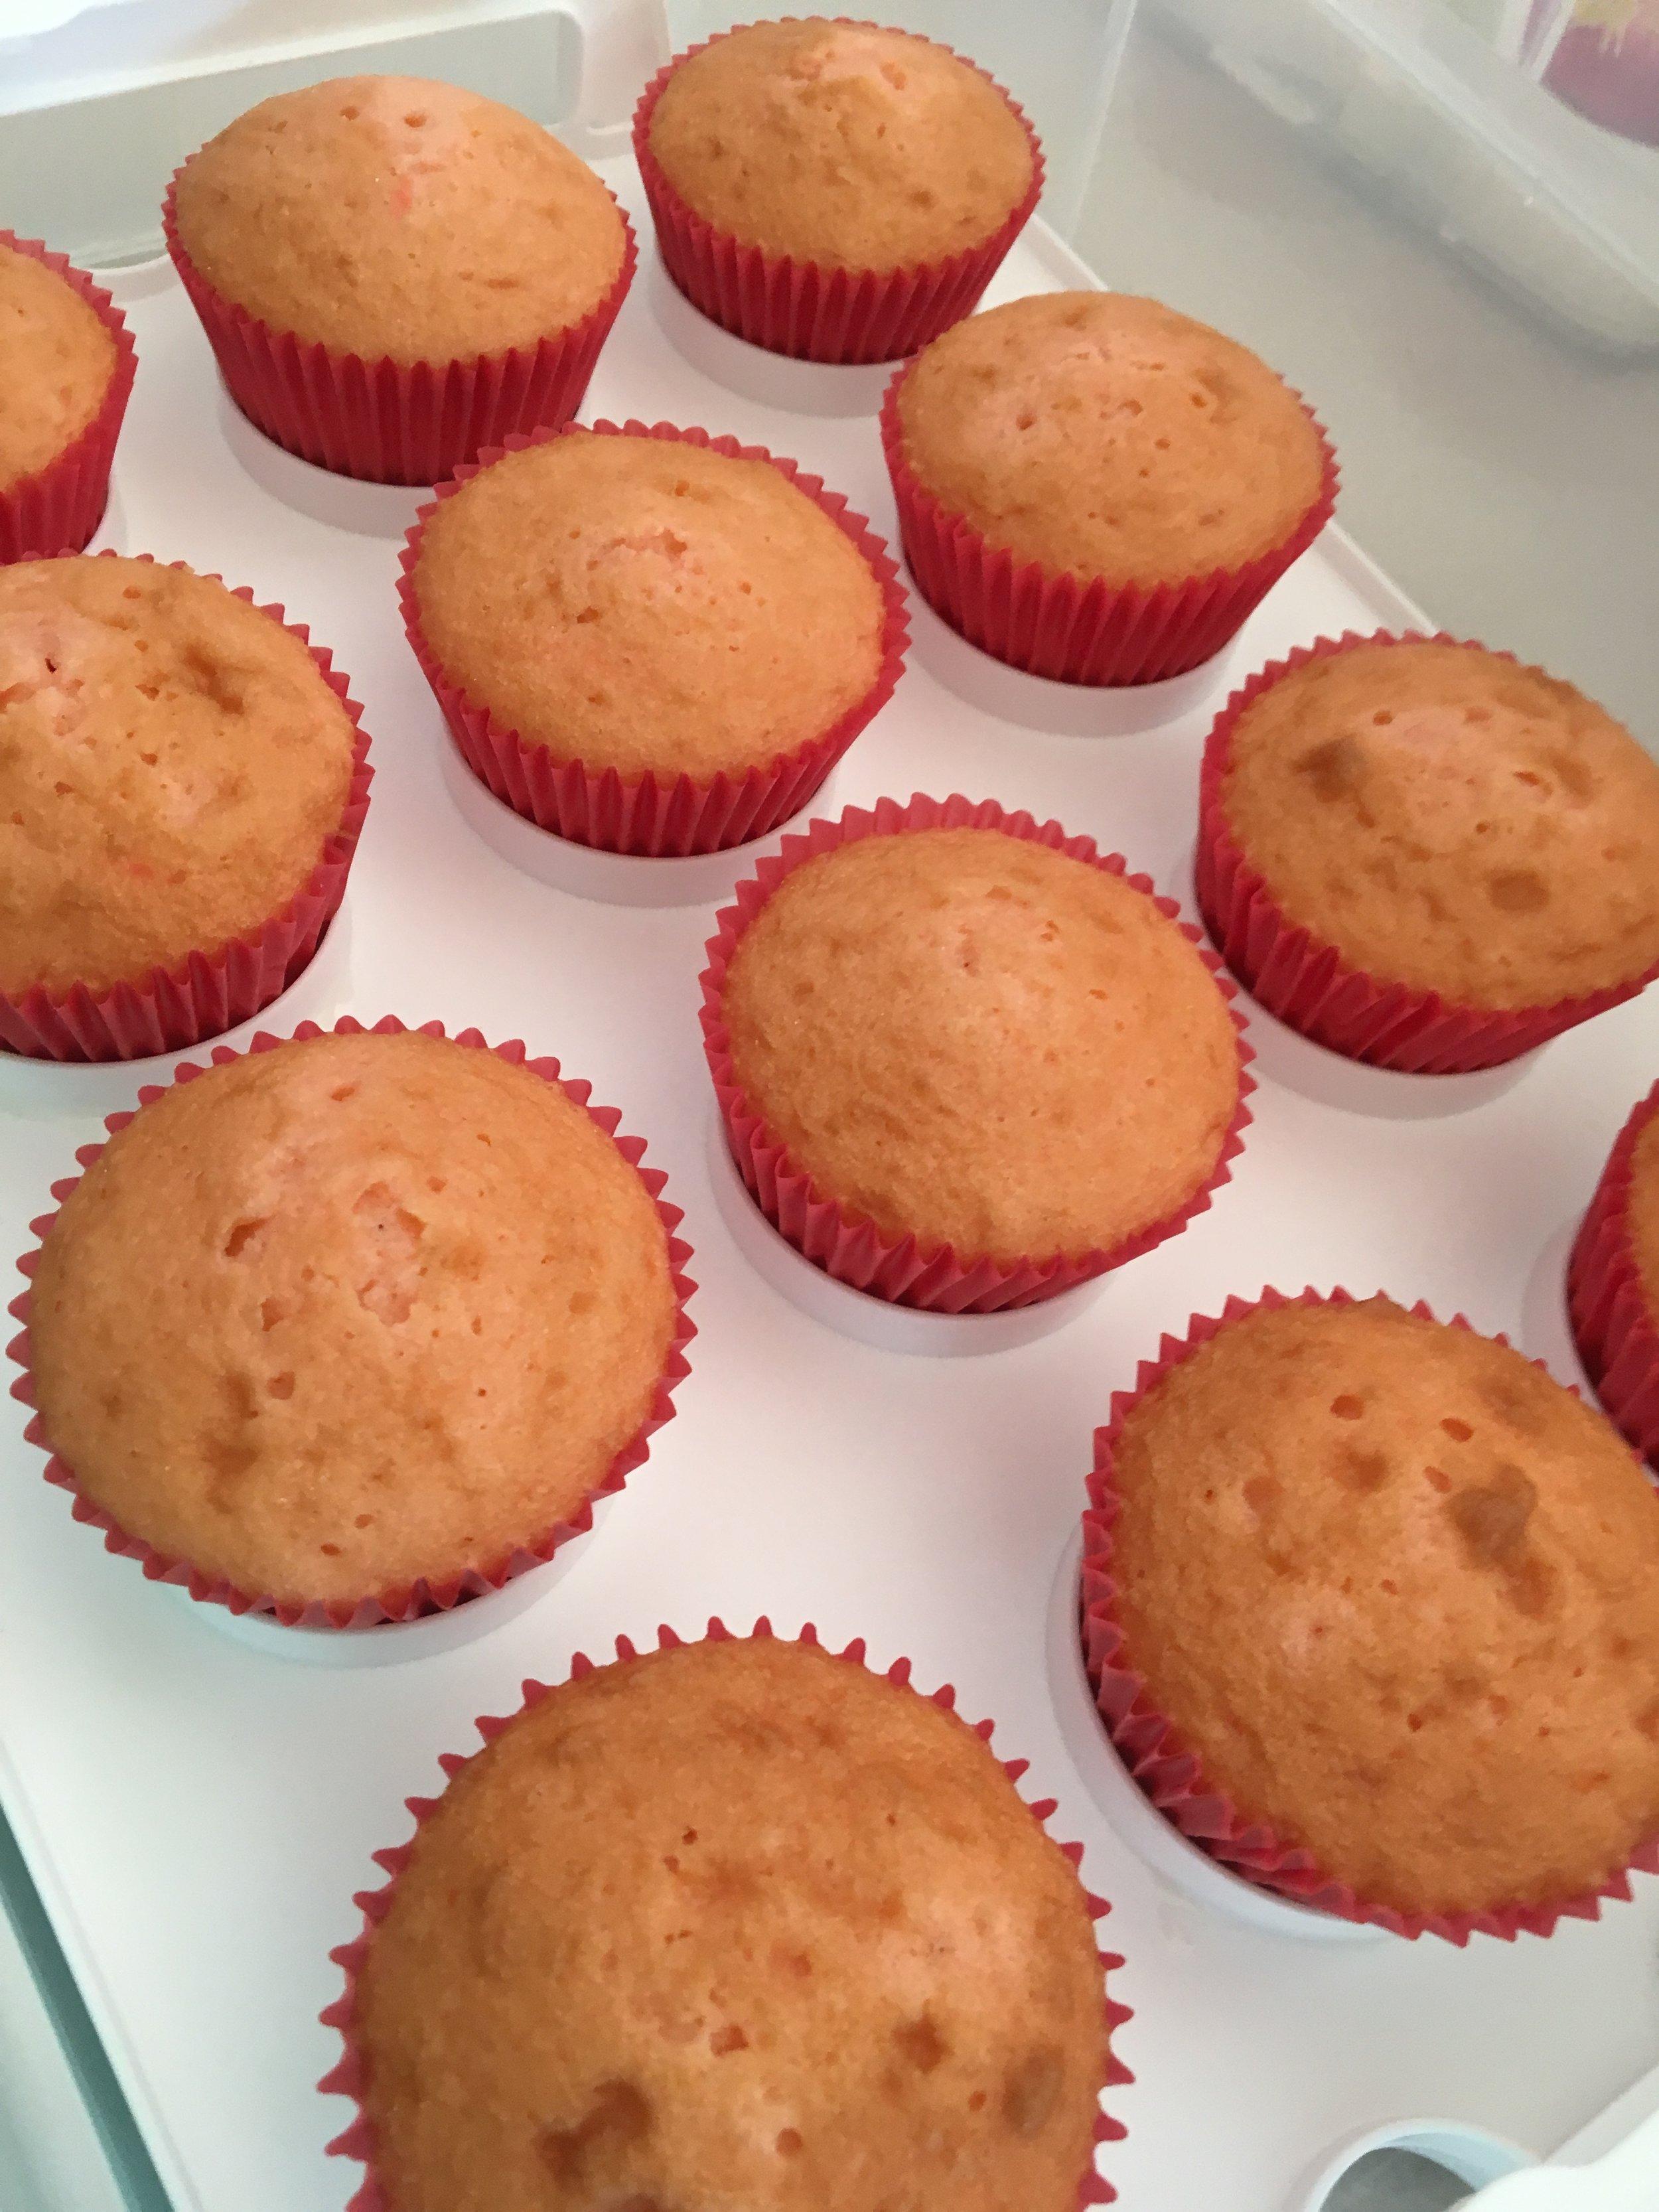 1_Cupcakes.JPG